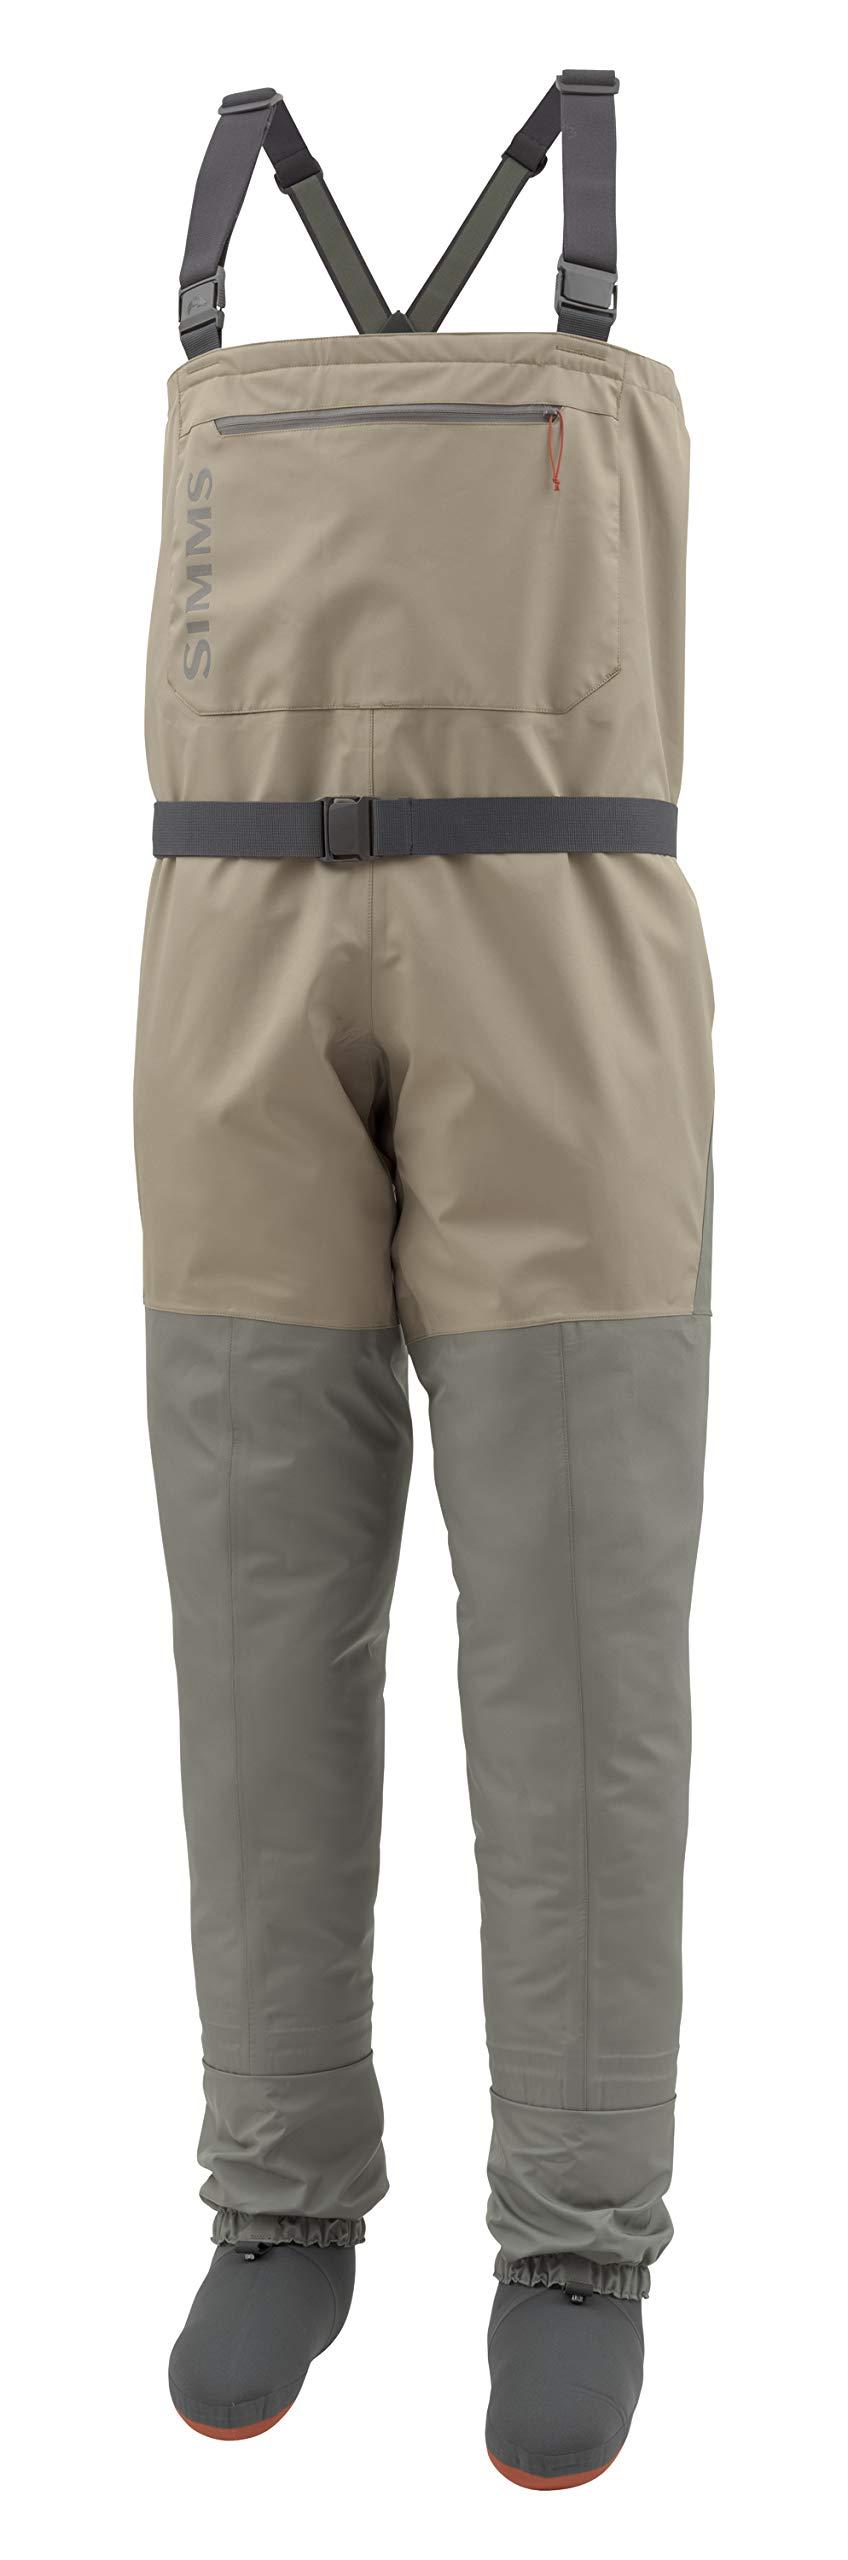 Simms Tributary Stockingfoot Waders, Men's Fly Fishing Chest Waders, Durable, Breathable, Neoprene, Waterproof